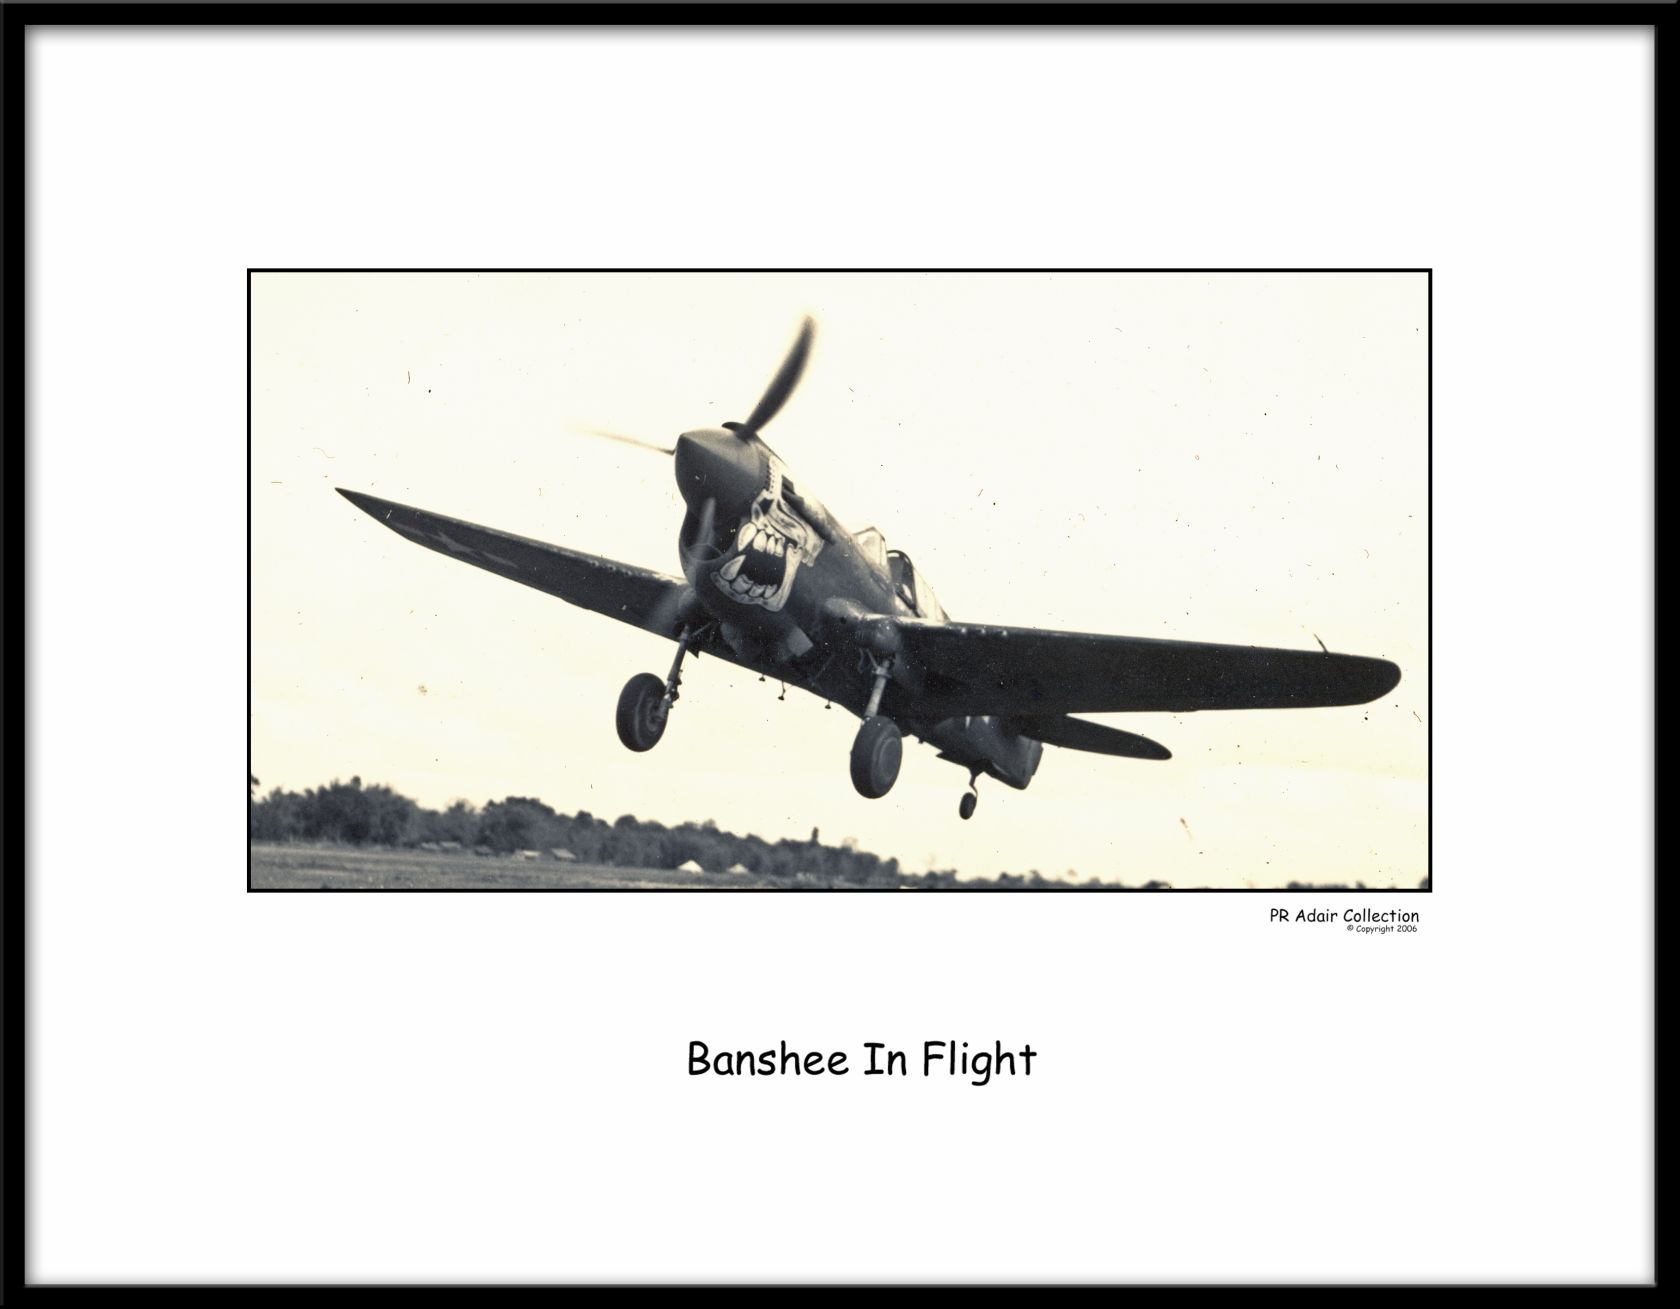 Burma Banshee 154